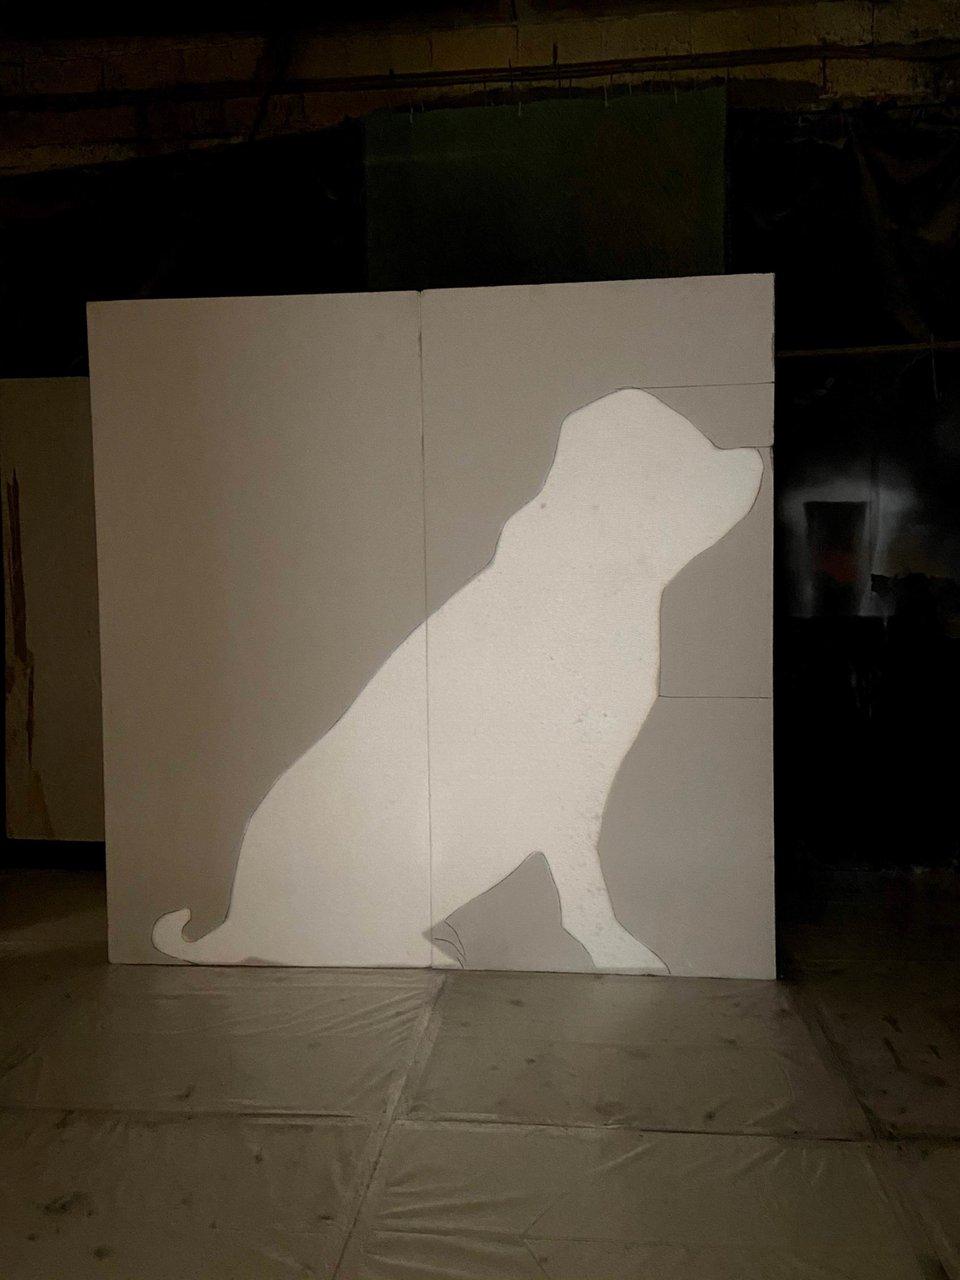 Fomo - 8 ft. Topiary Dog Sculpt photo 9945CD3C-EF34-423F-9737-4EADB6706A67.jpg